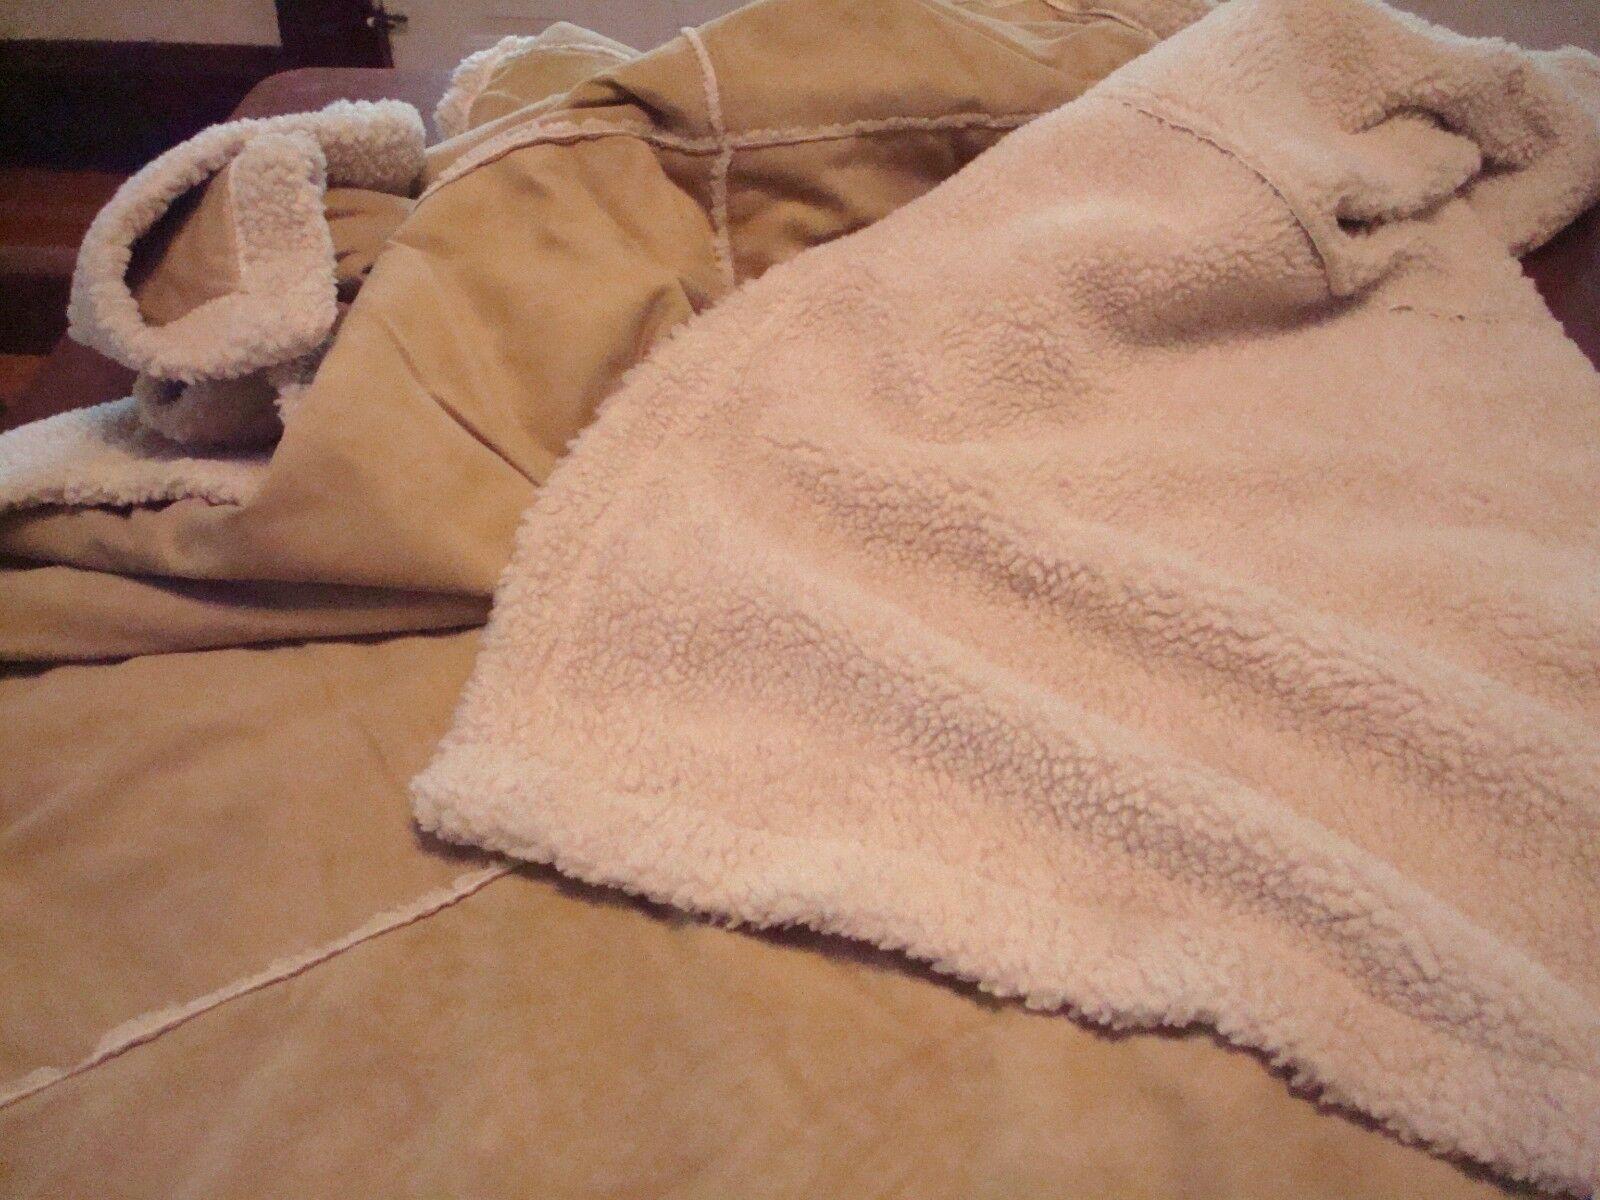 Faux Lambs Wool Sherpa Throw Blanket Tan Natural